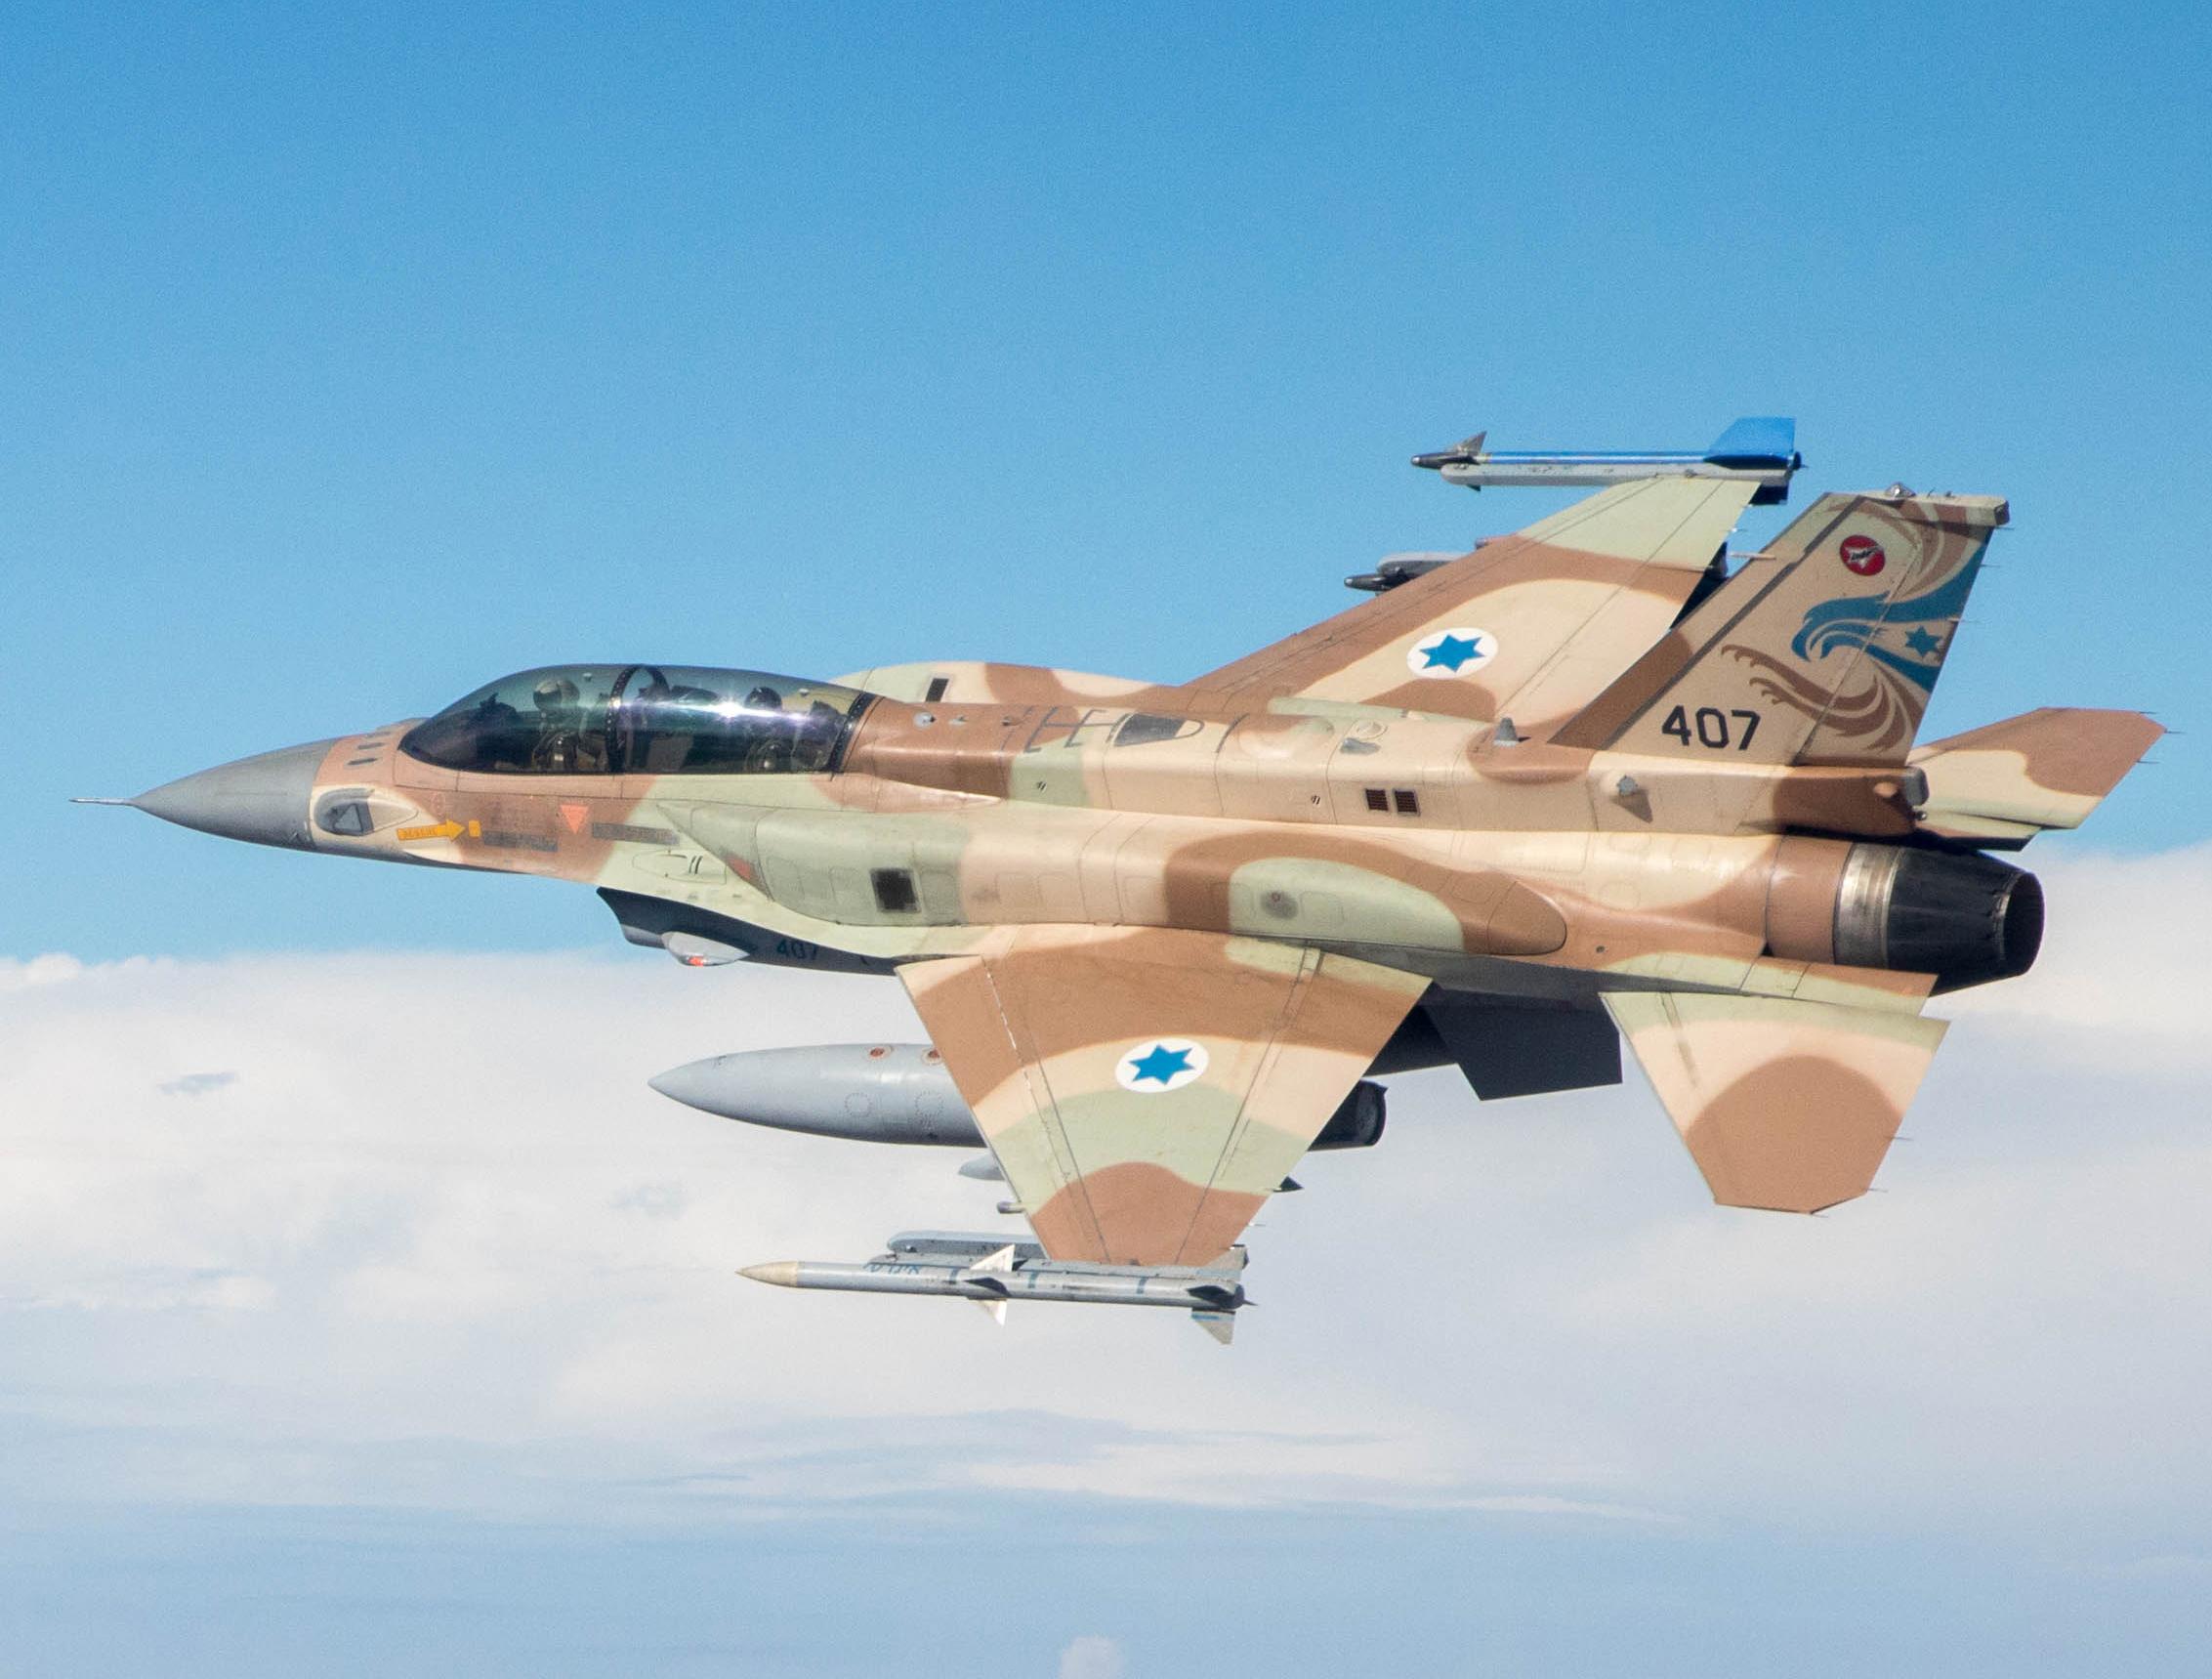 Israeli Warplanes Strikes Hamas' Naval Positions Following Rocket Launch From Gaza